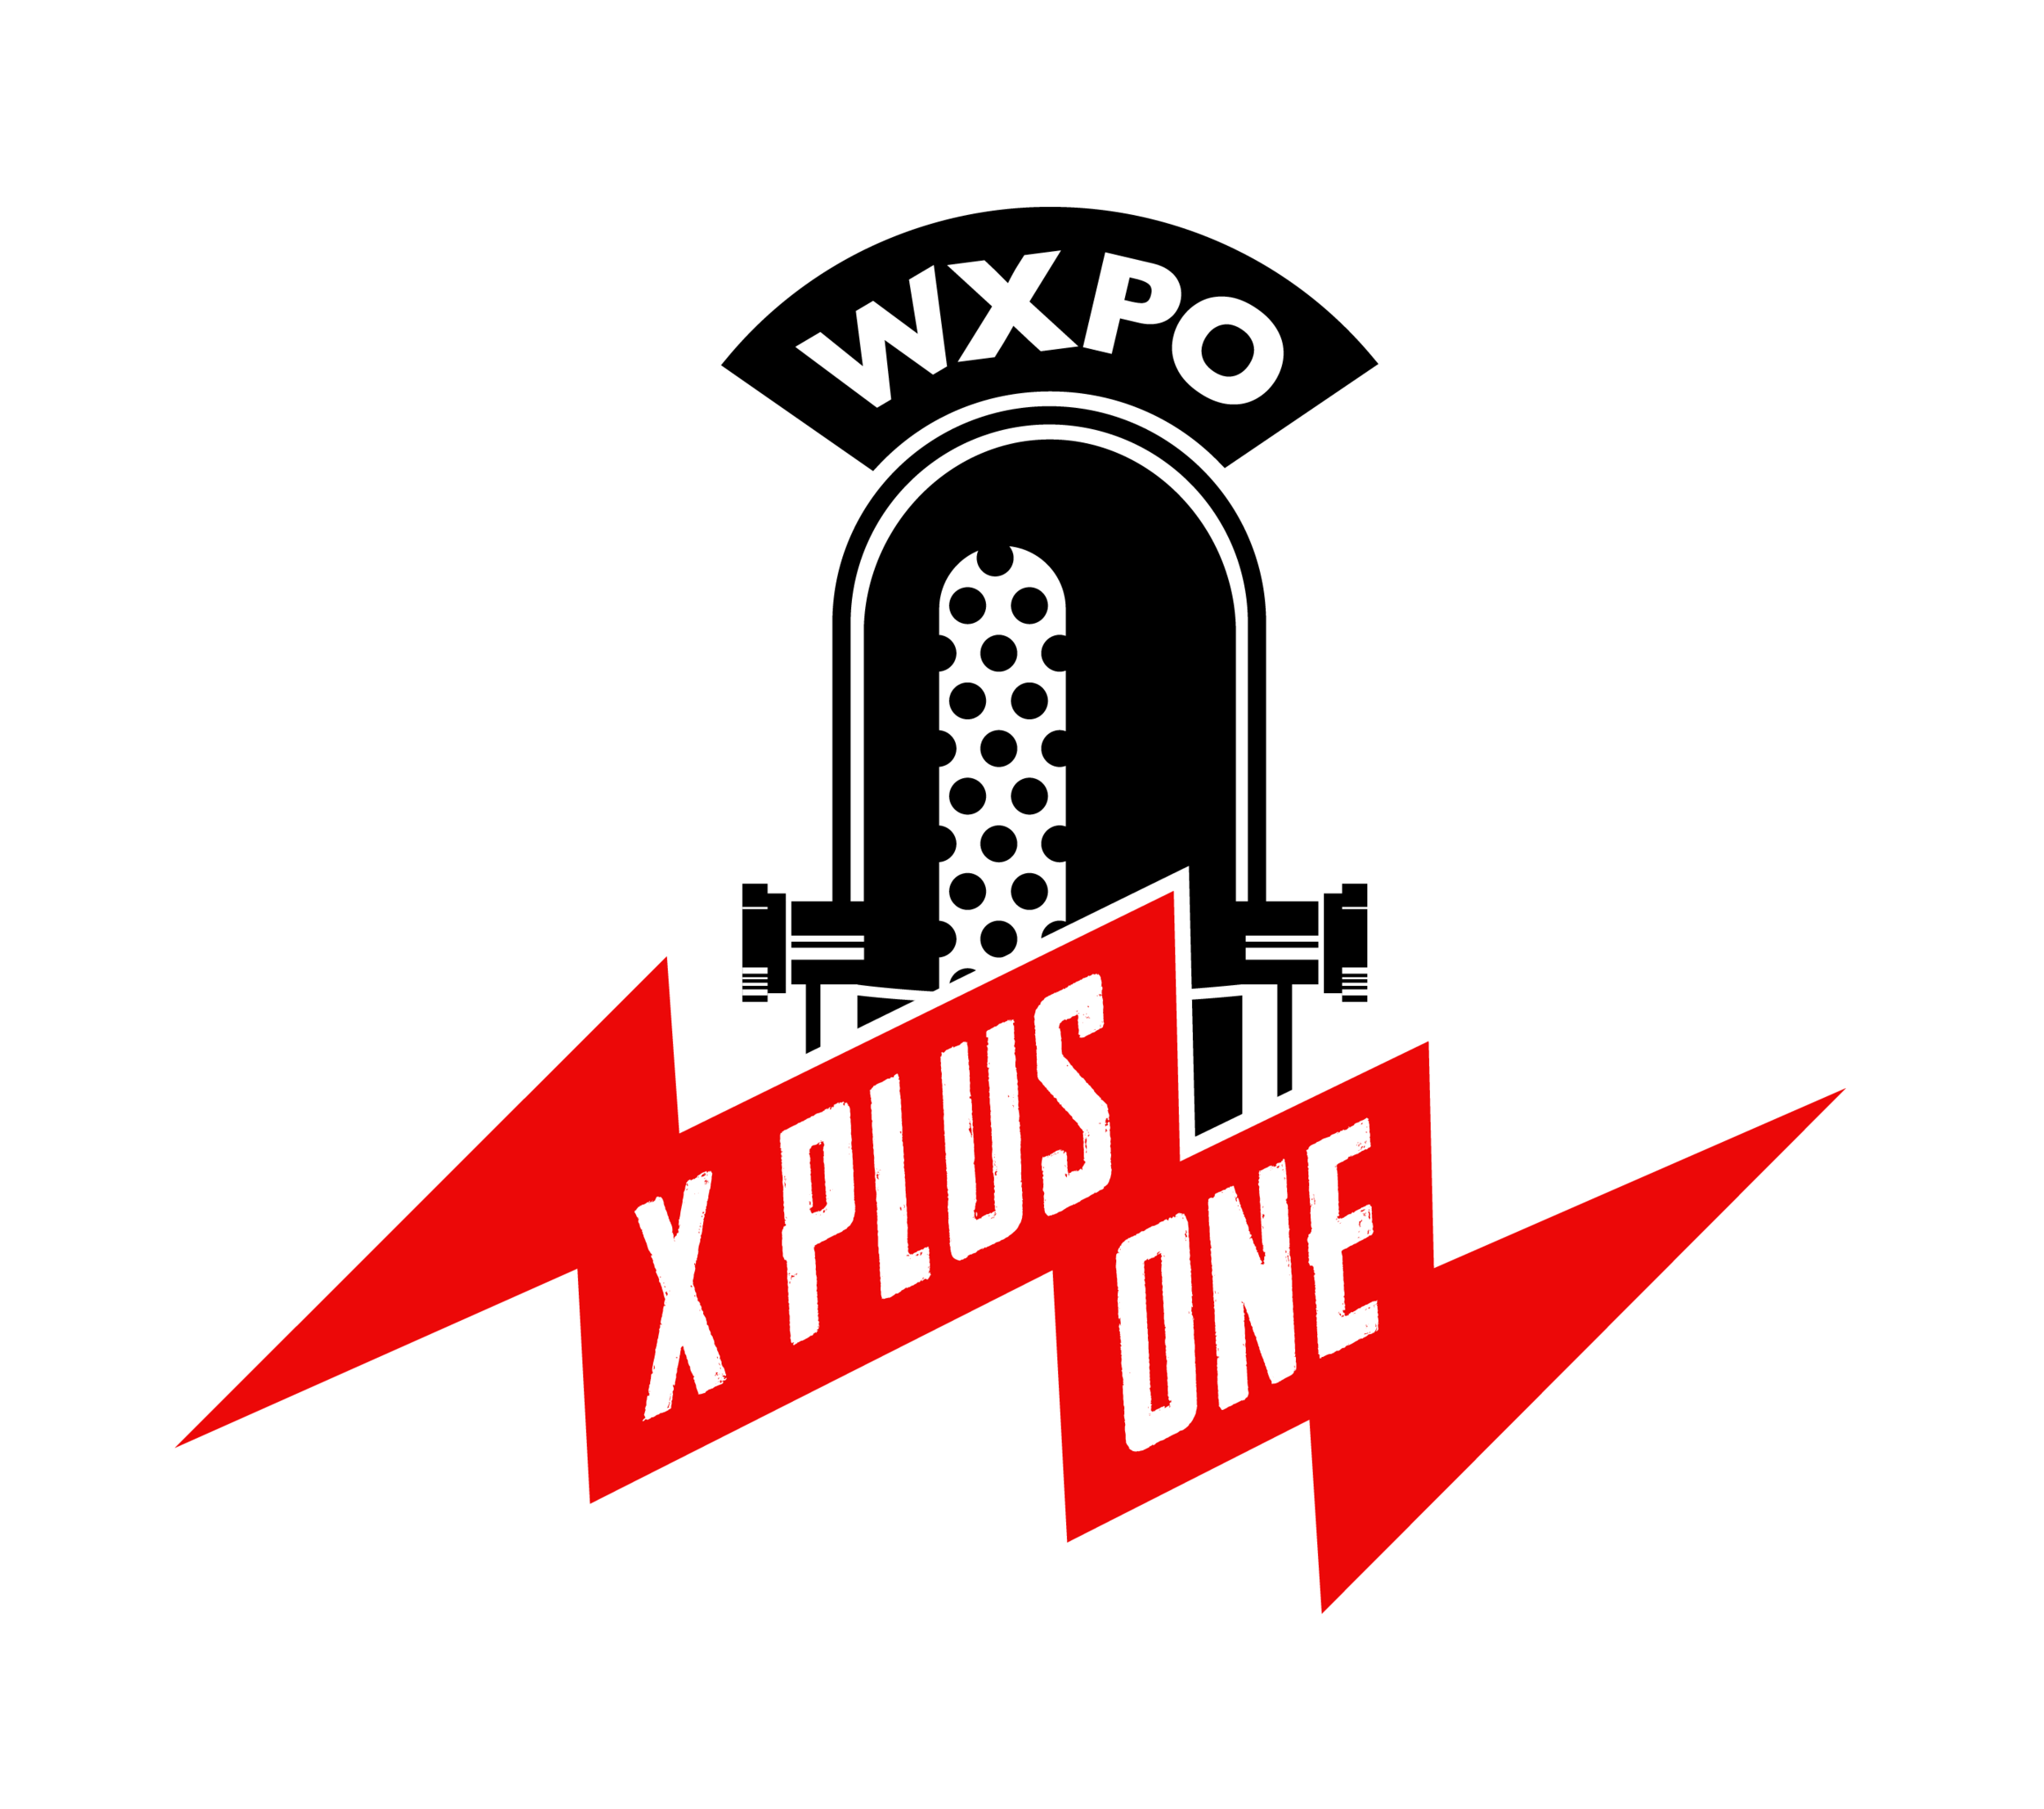 The X Plus One logo courtesy ofdesigner extraordinaire Aaron Webber -